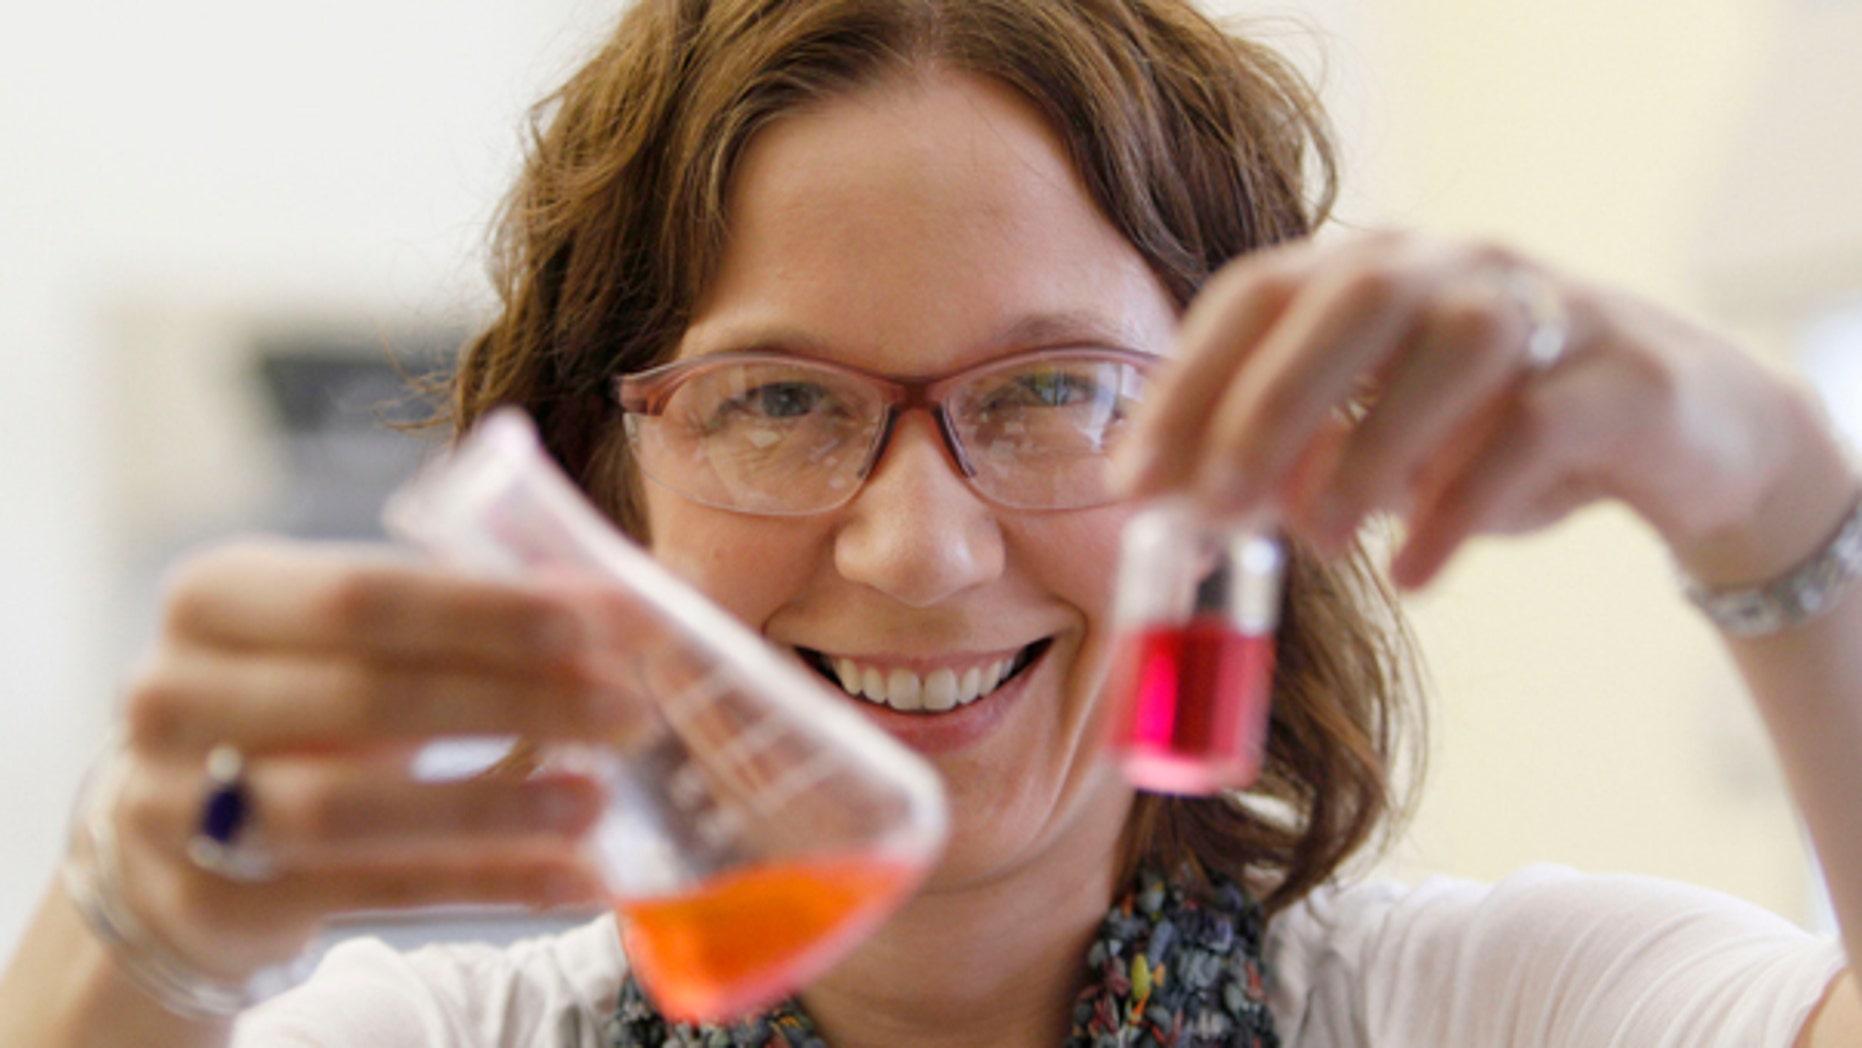 Sept. 15, 2011: William & Mary professor Elizabeth Harbron displays vials with merocyanine and rhodamine dye in her lab in Williamsburg, Va.